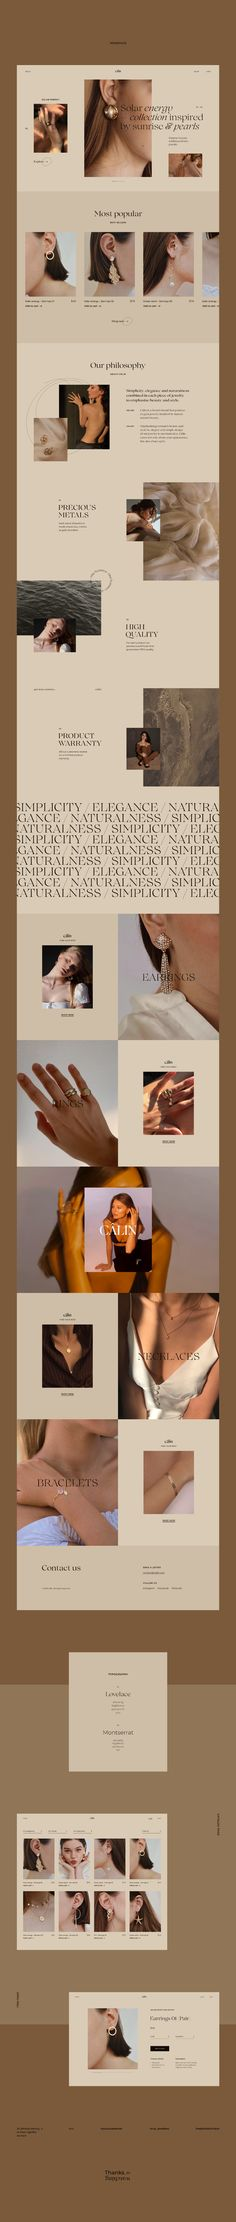 Câlin Jewelry on Behance Web Design Trends, Web Design Projects, Website Layout, Website Design Inspiration, Web Banner Design, Layout Design, Design Design, Ecommerce, Web Design Mobile